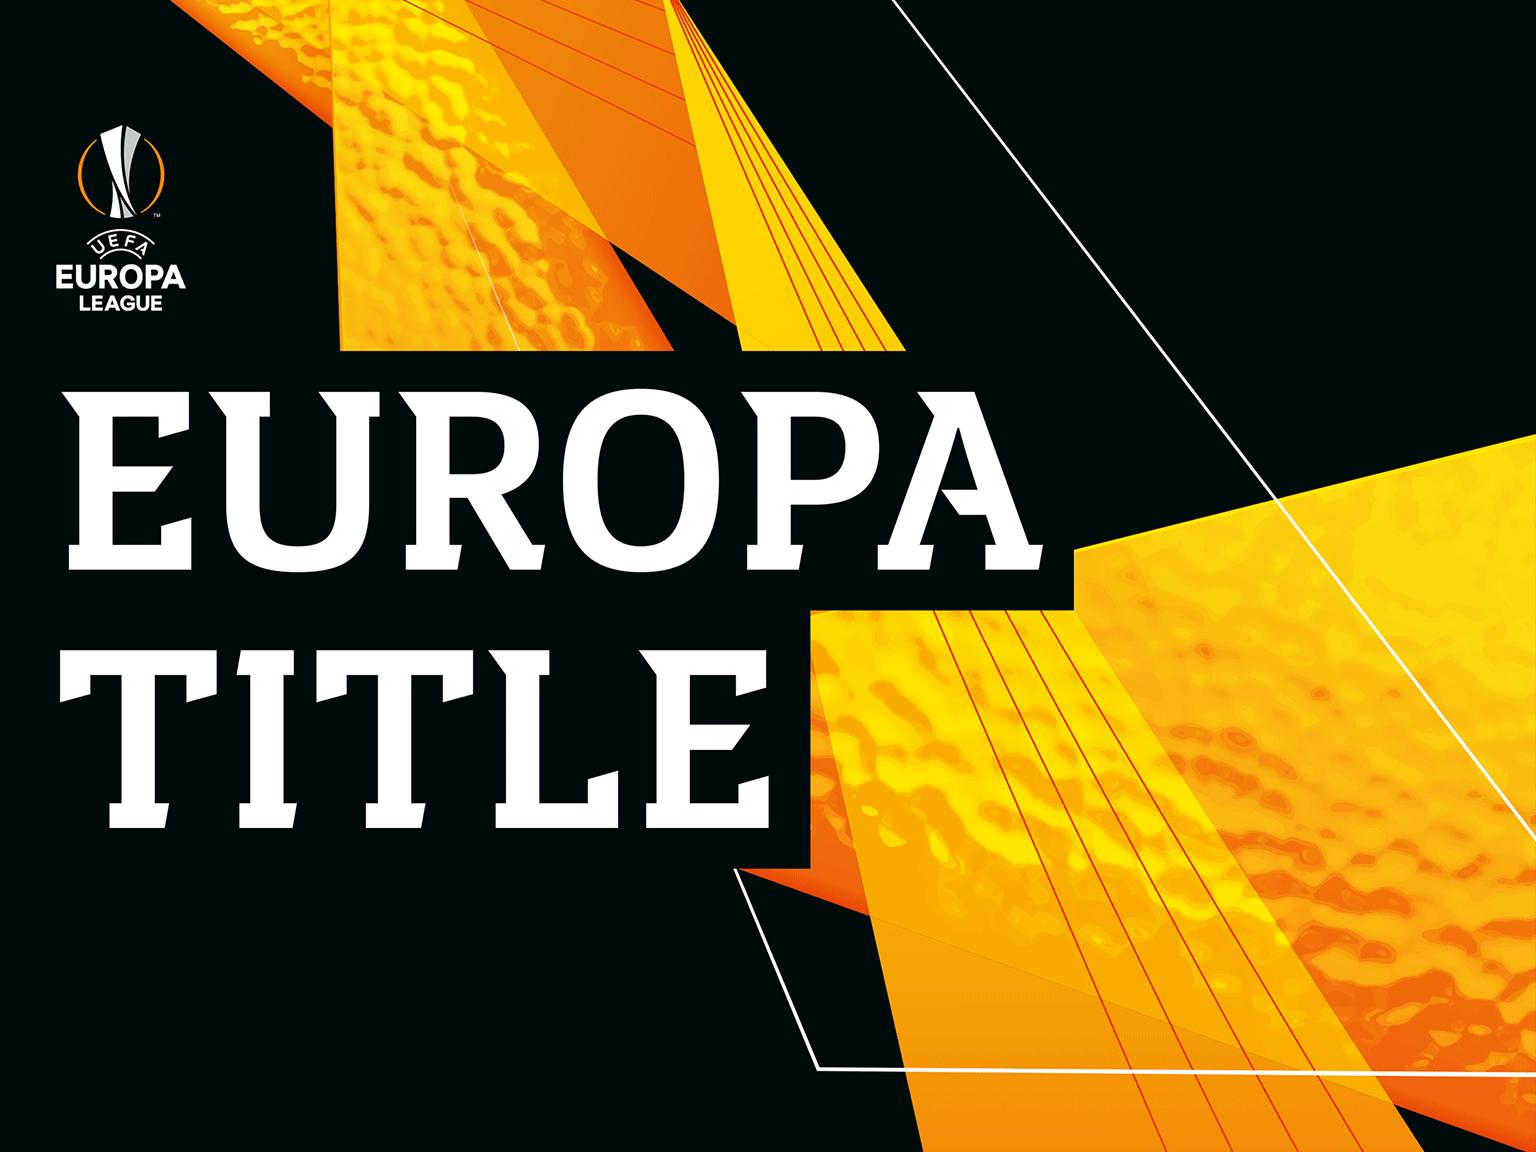 Europa League: a selection of sites